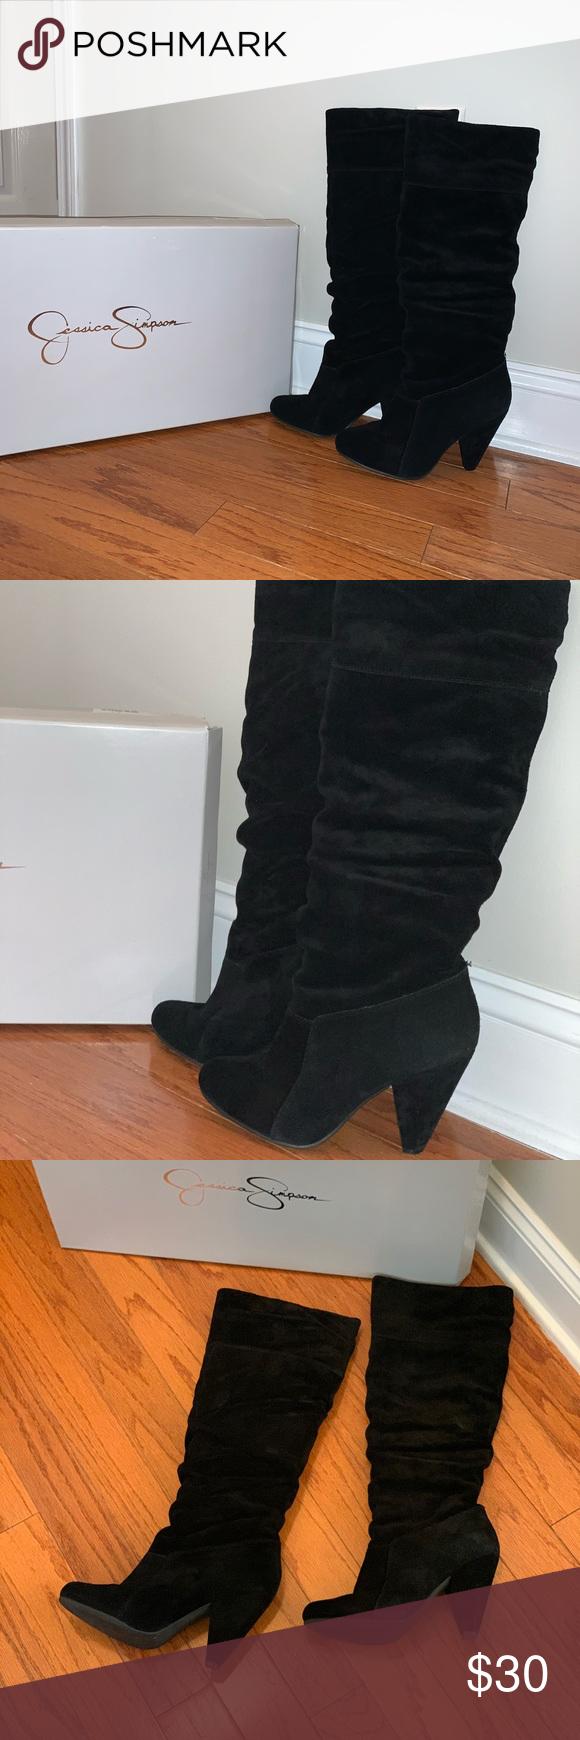 Jessica Simpson black suede boots